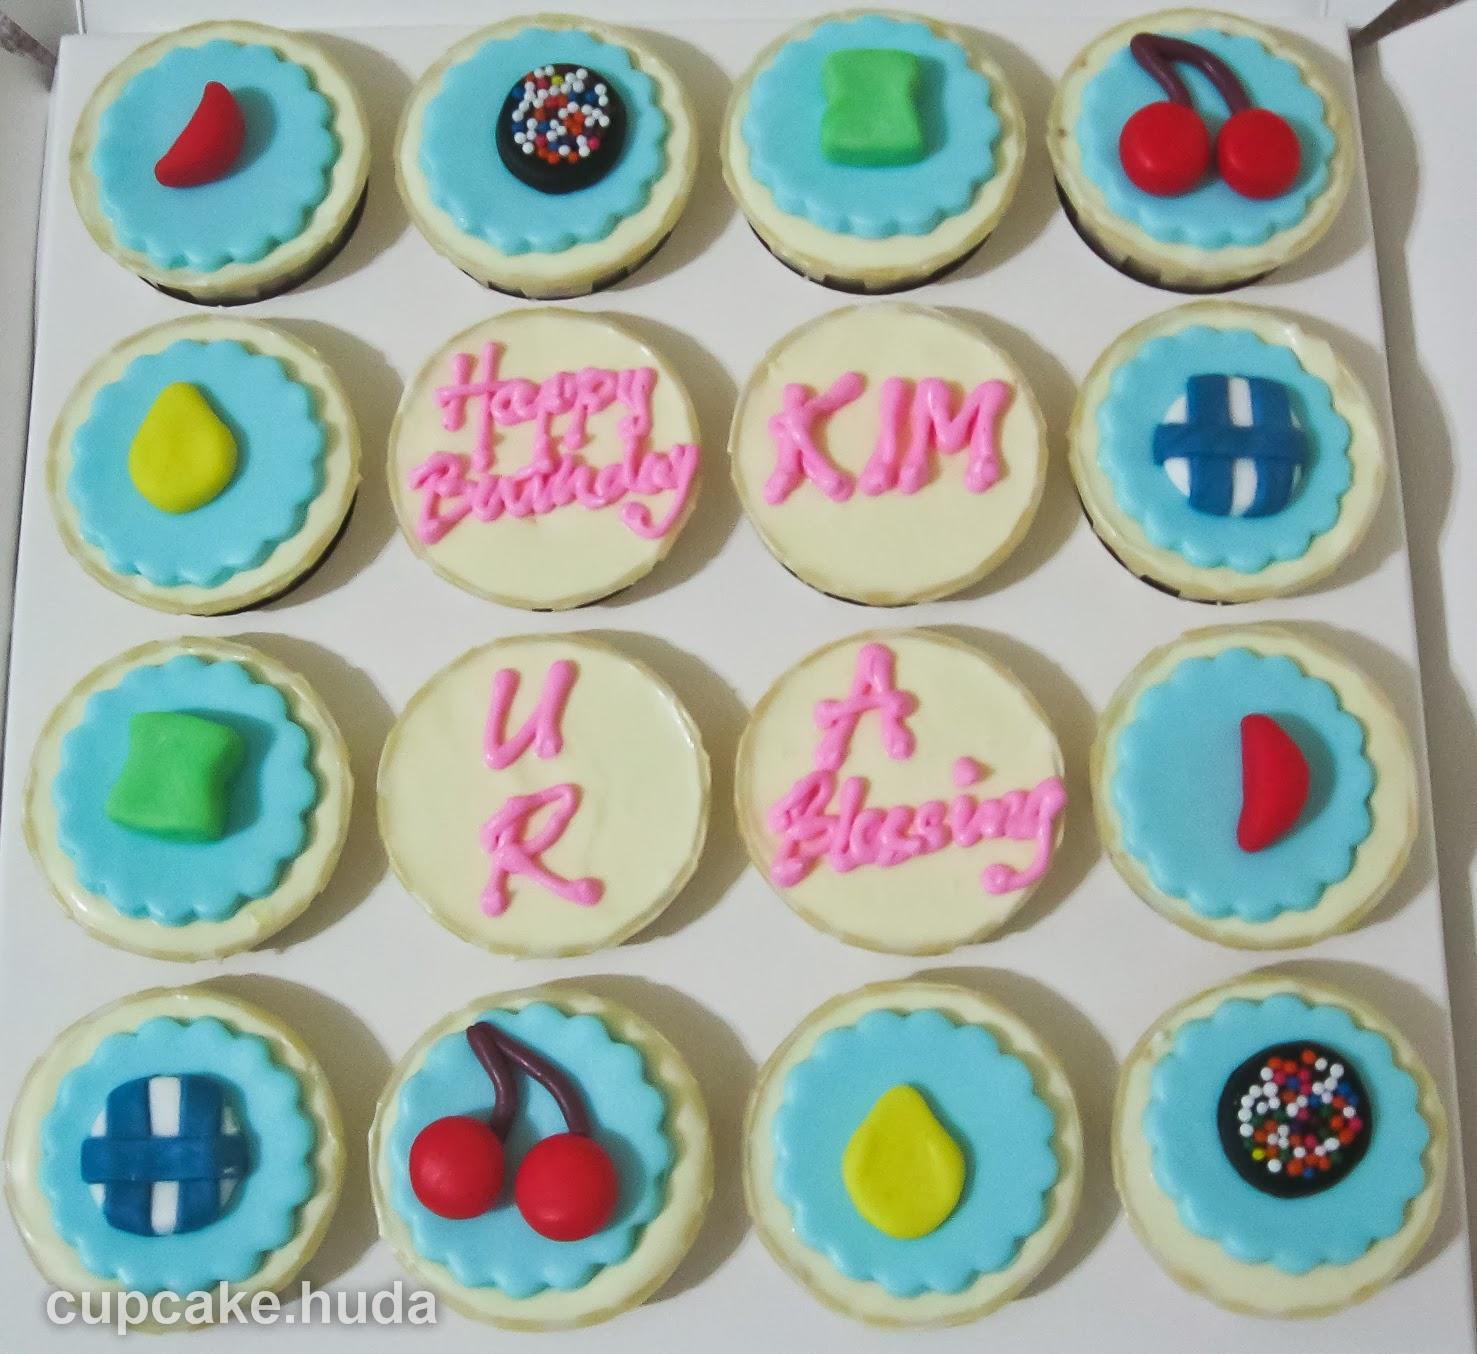 Candy Crush Theme Happy Birthday Kim